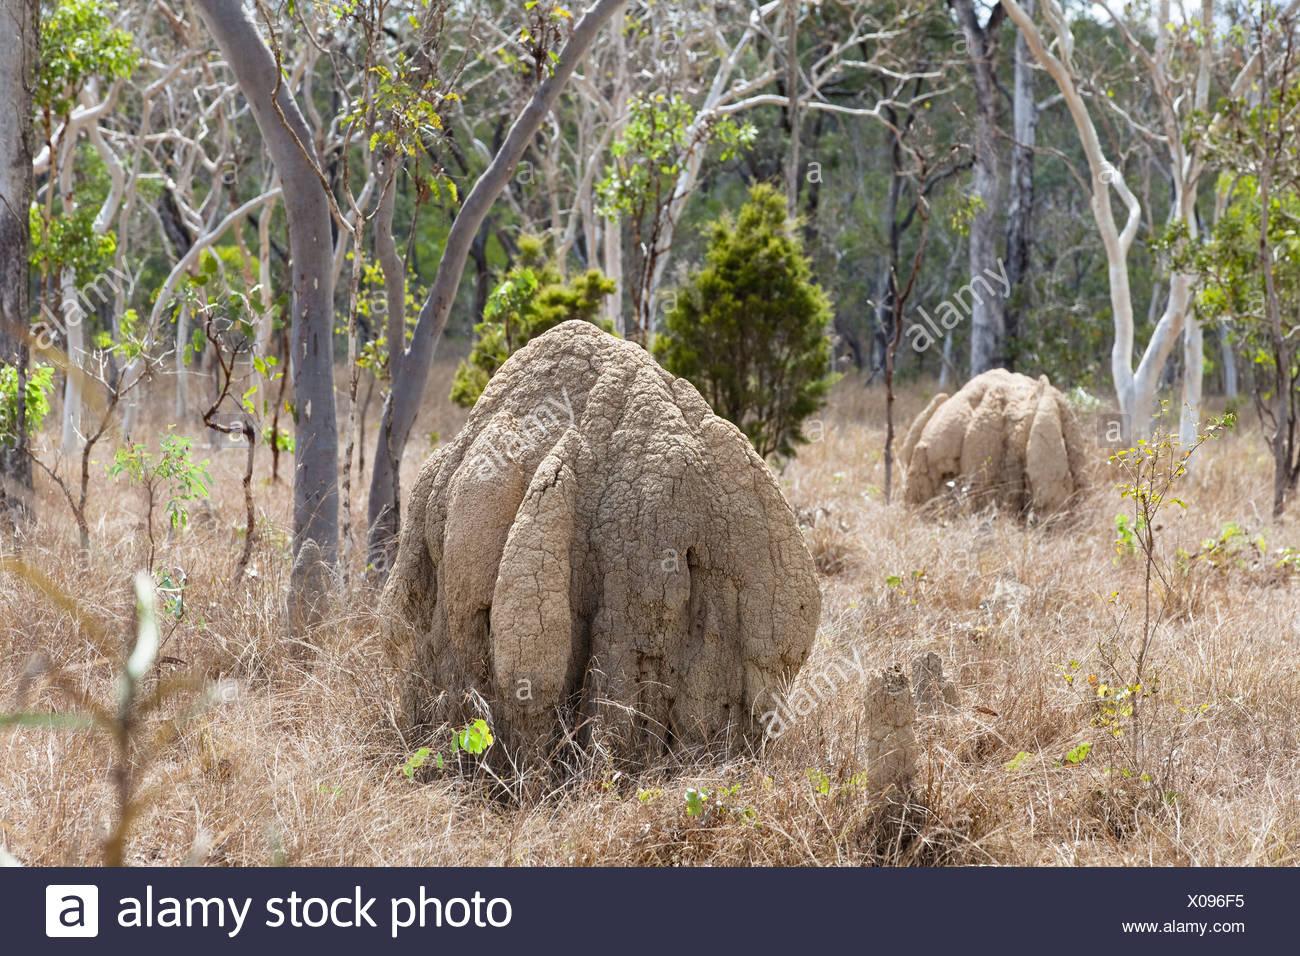 Bulbous termite mounds near Mareeba, North Queensland, Australia - Stock Image